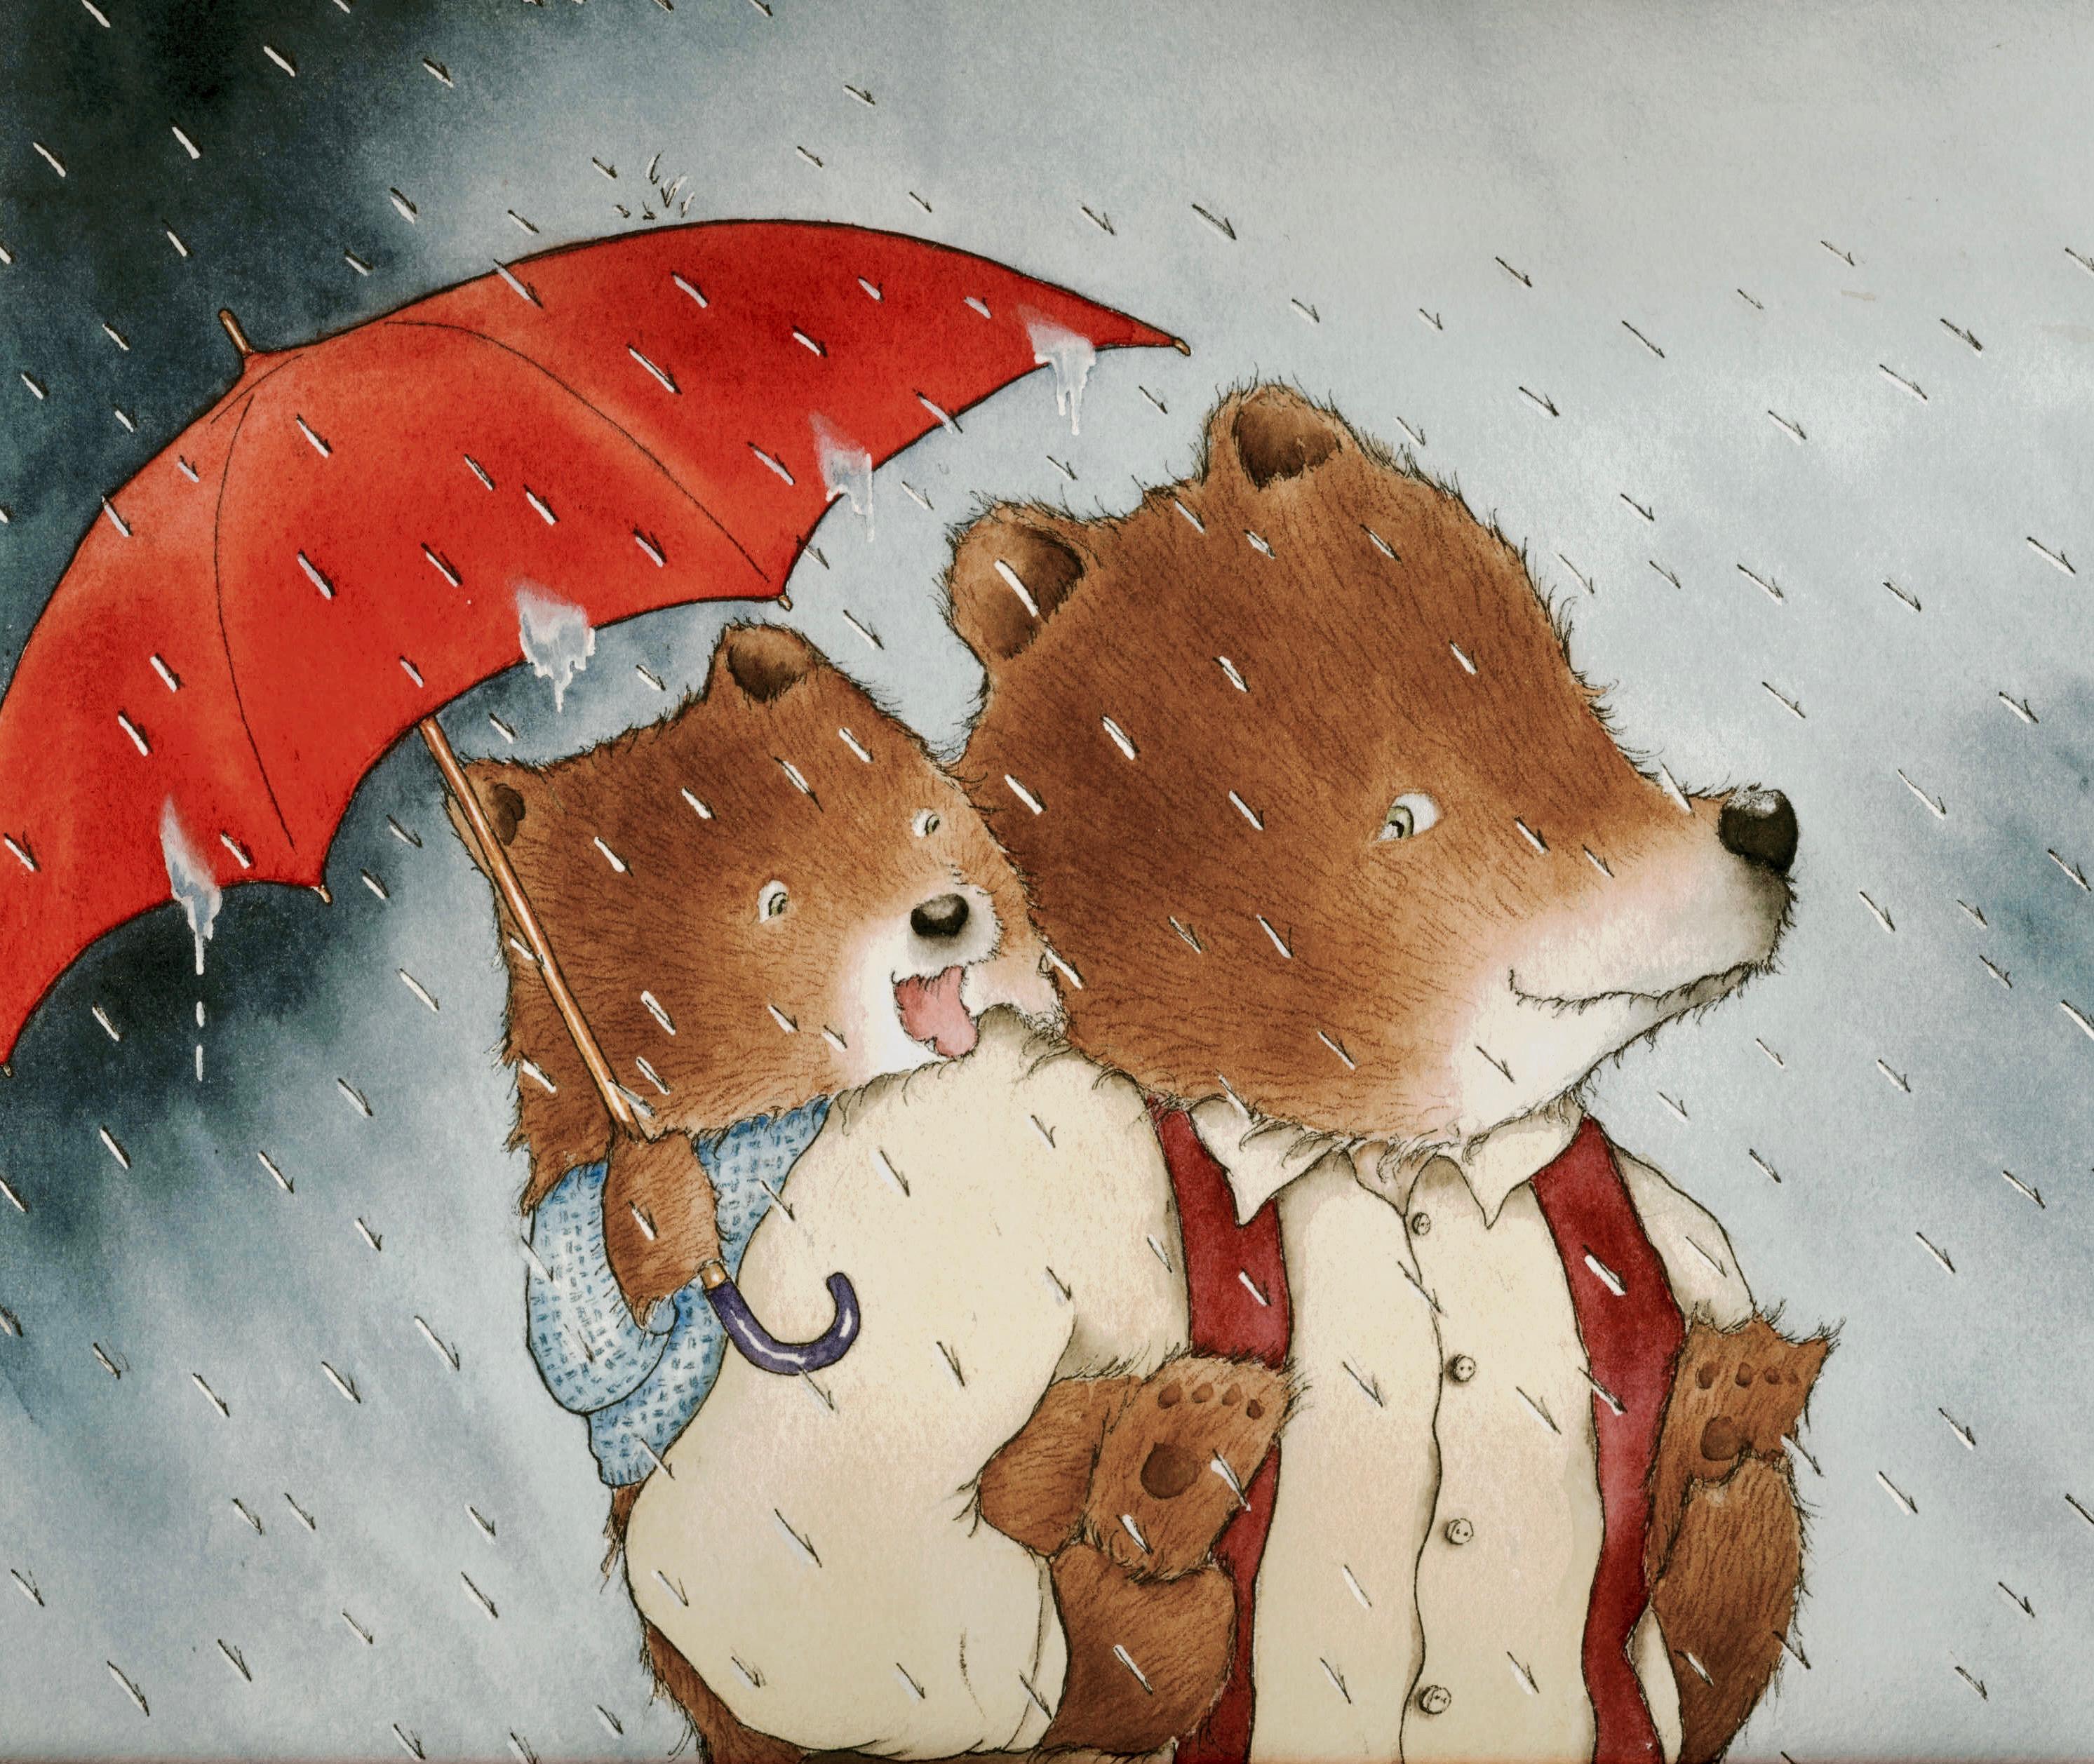 Little Brown Bear in the Rain